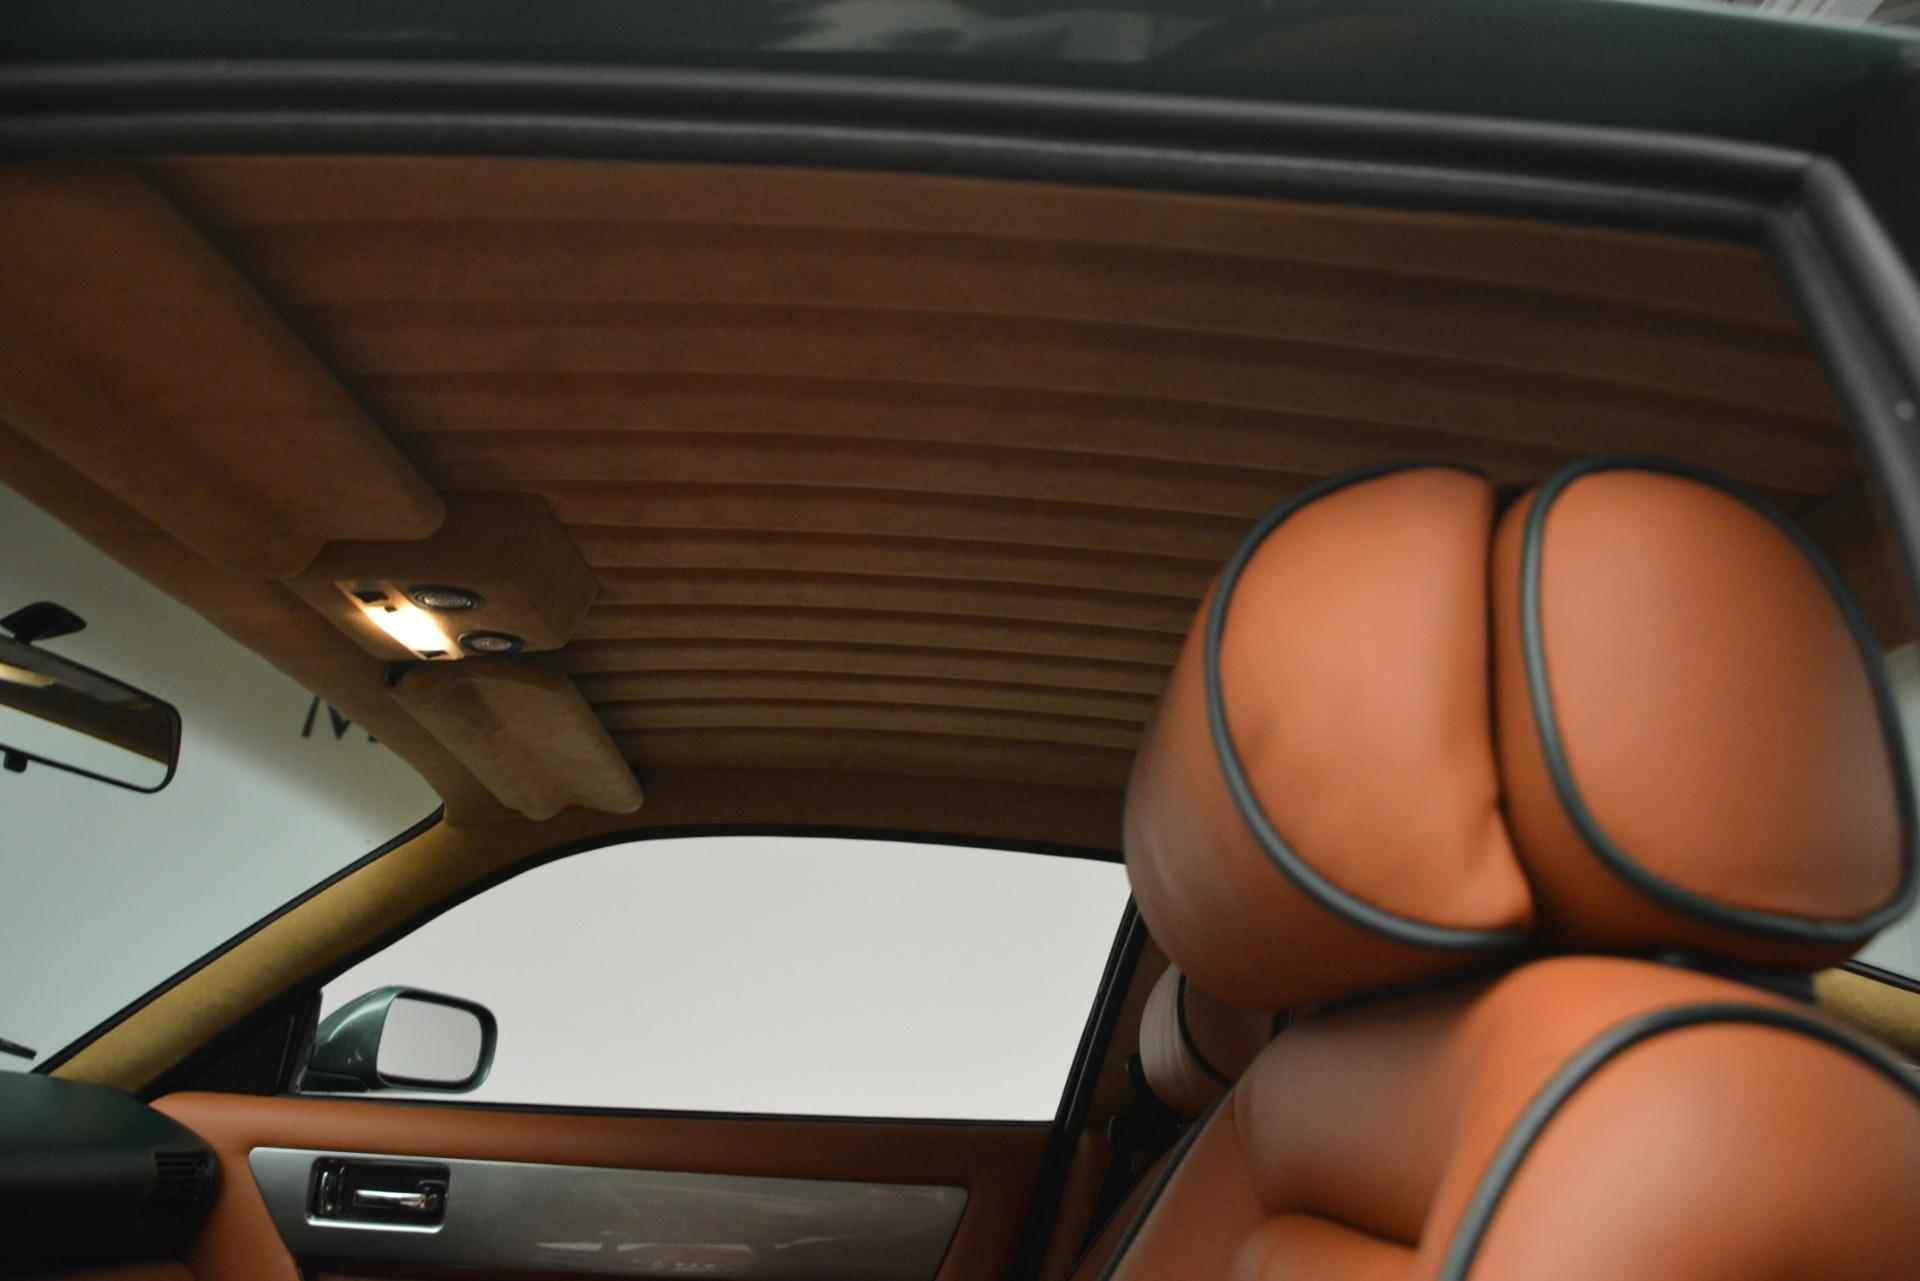 Used 1999 Aston Martin V8 Vantage Le Mans V600 Coupe For Sale In Greenwich, CT. Alfa Romeo of Greenwich, 7449C 2789_p22